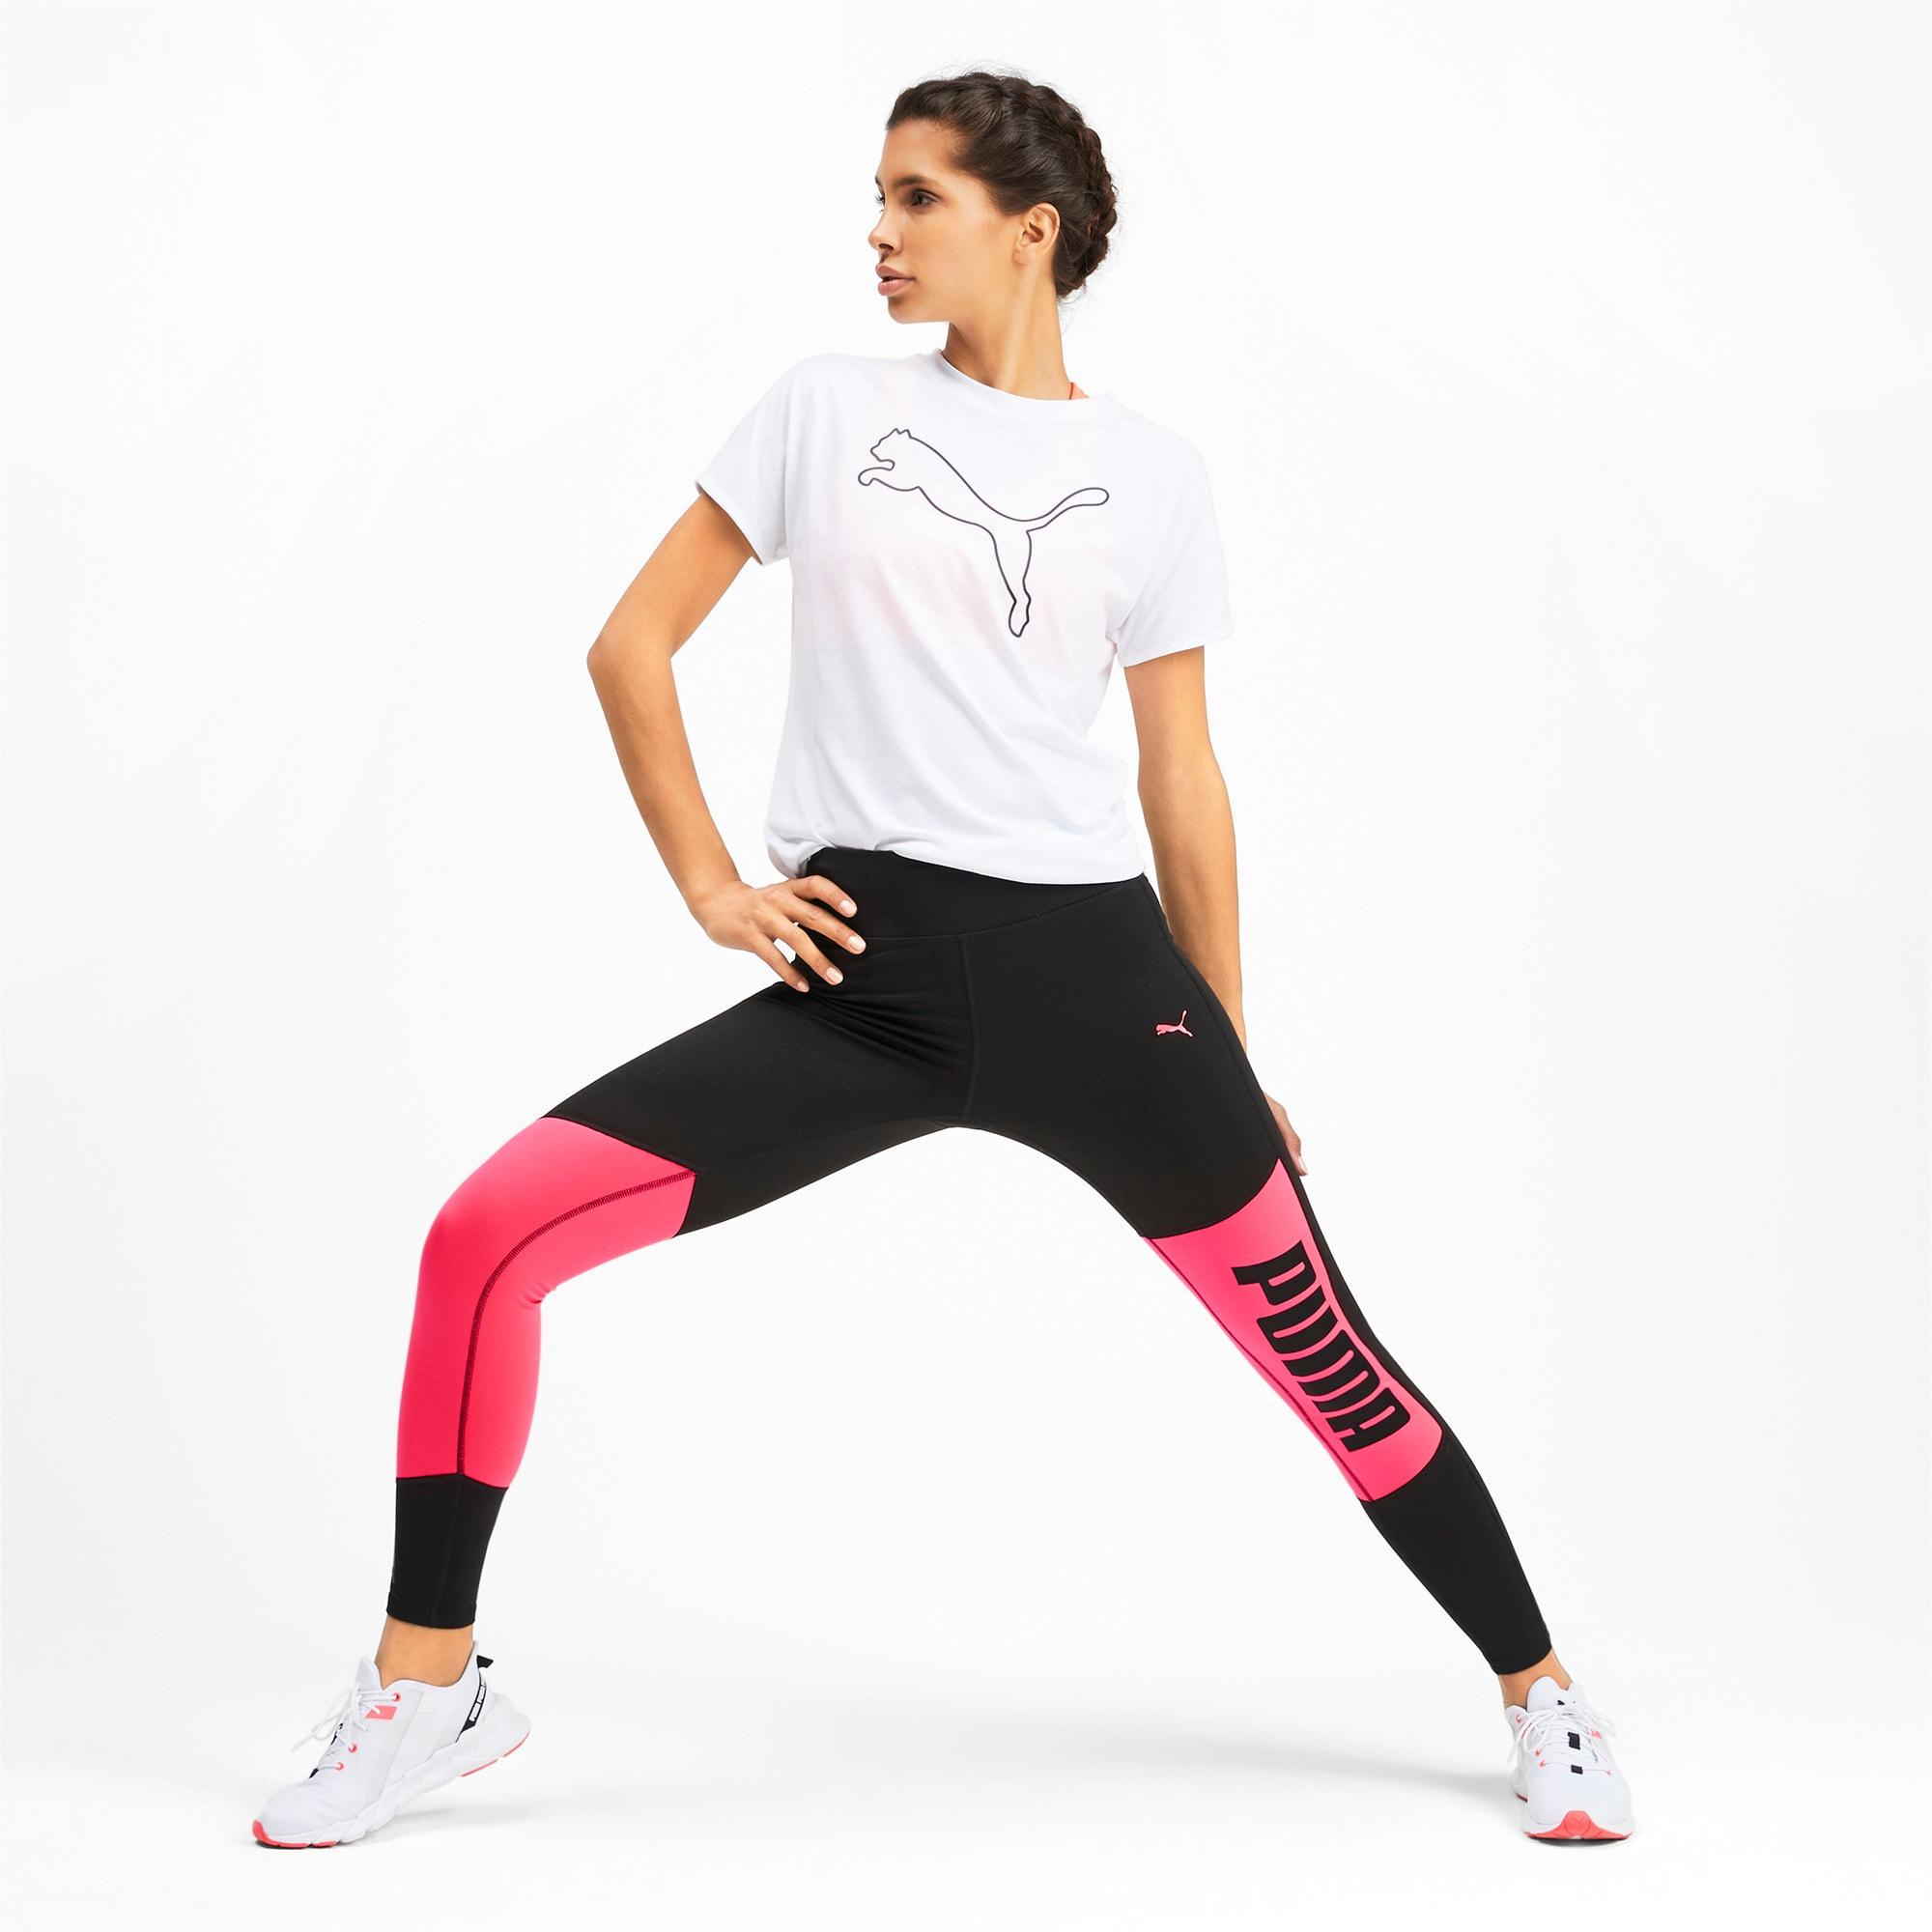 Thumbnail 3 of Logo Graphic Women's 7/8 Leggings, Puma Black-Pink Alert, medium